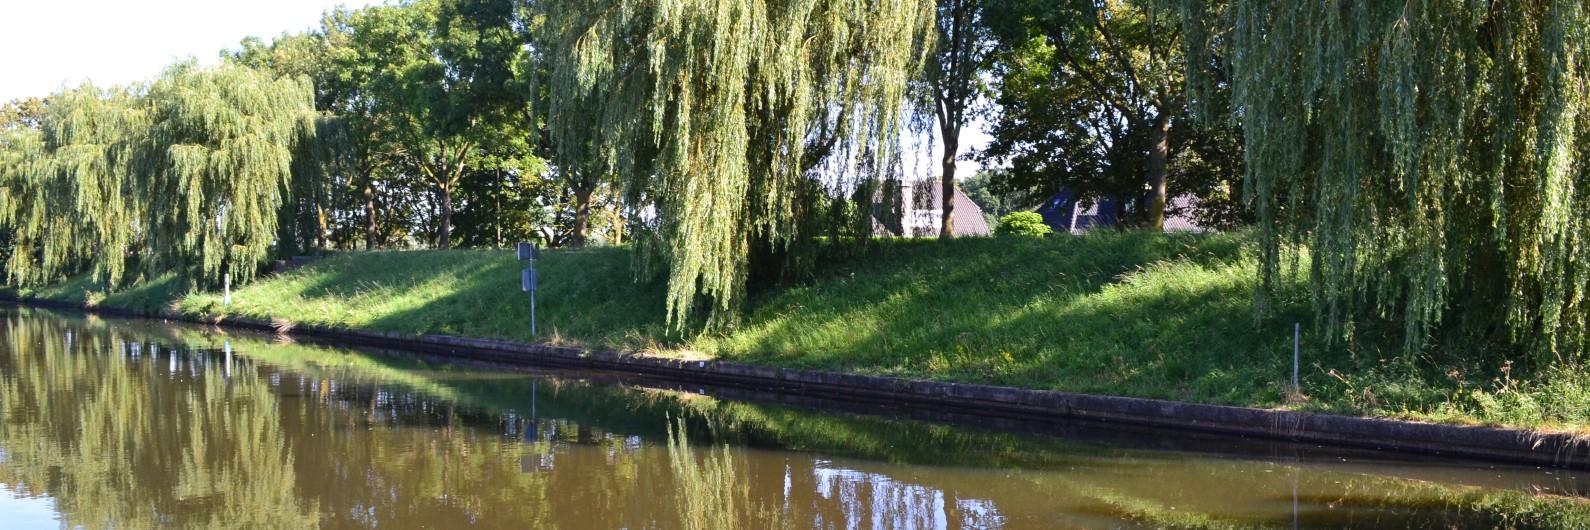 Bezienswaardigheden - Jachthaven Oudenbosch